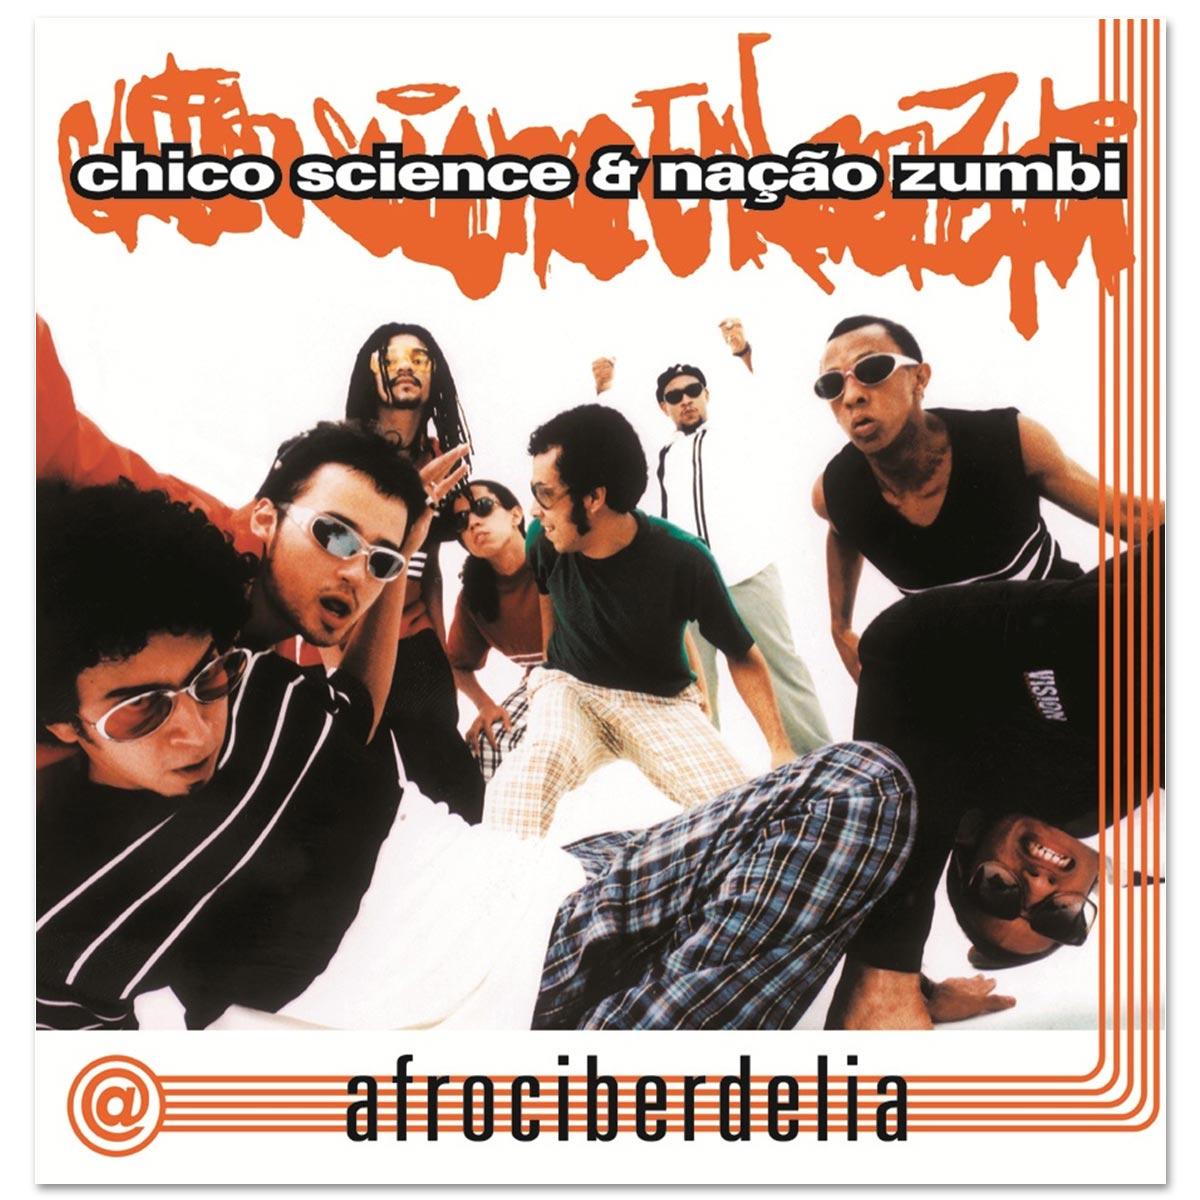 LP Chico Science & Nação Zumbi Afrociberdelia  - bandUP Store Marketplace